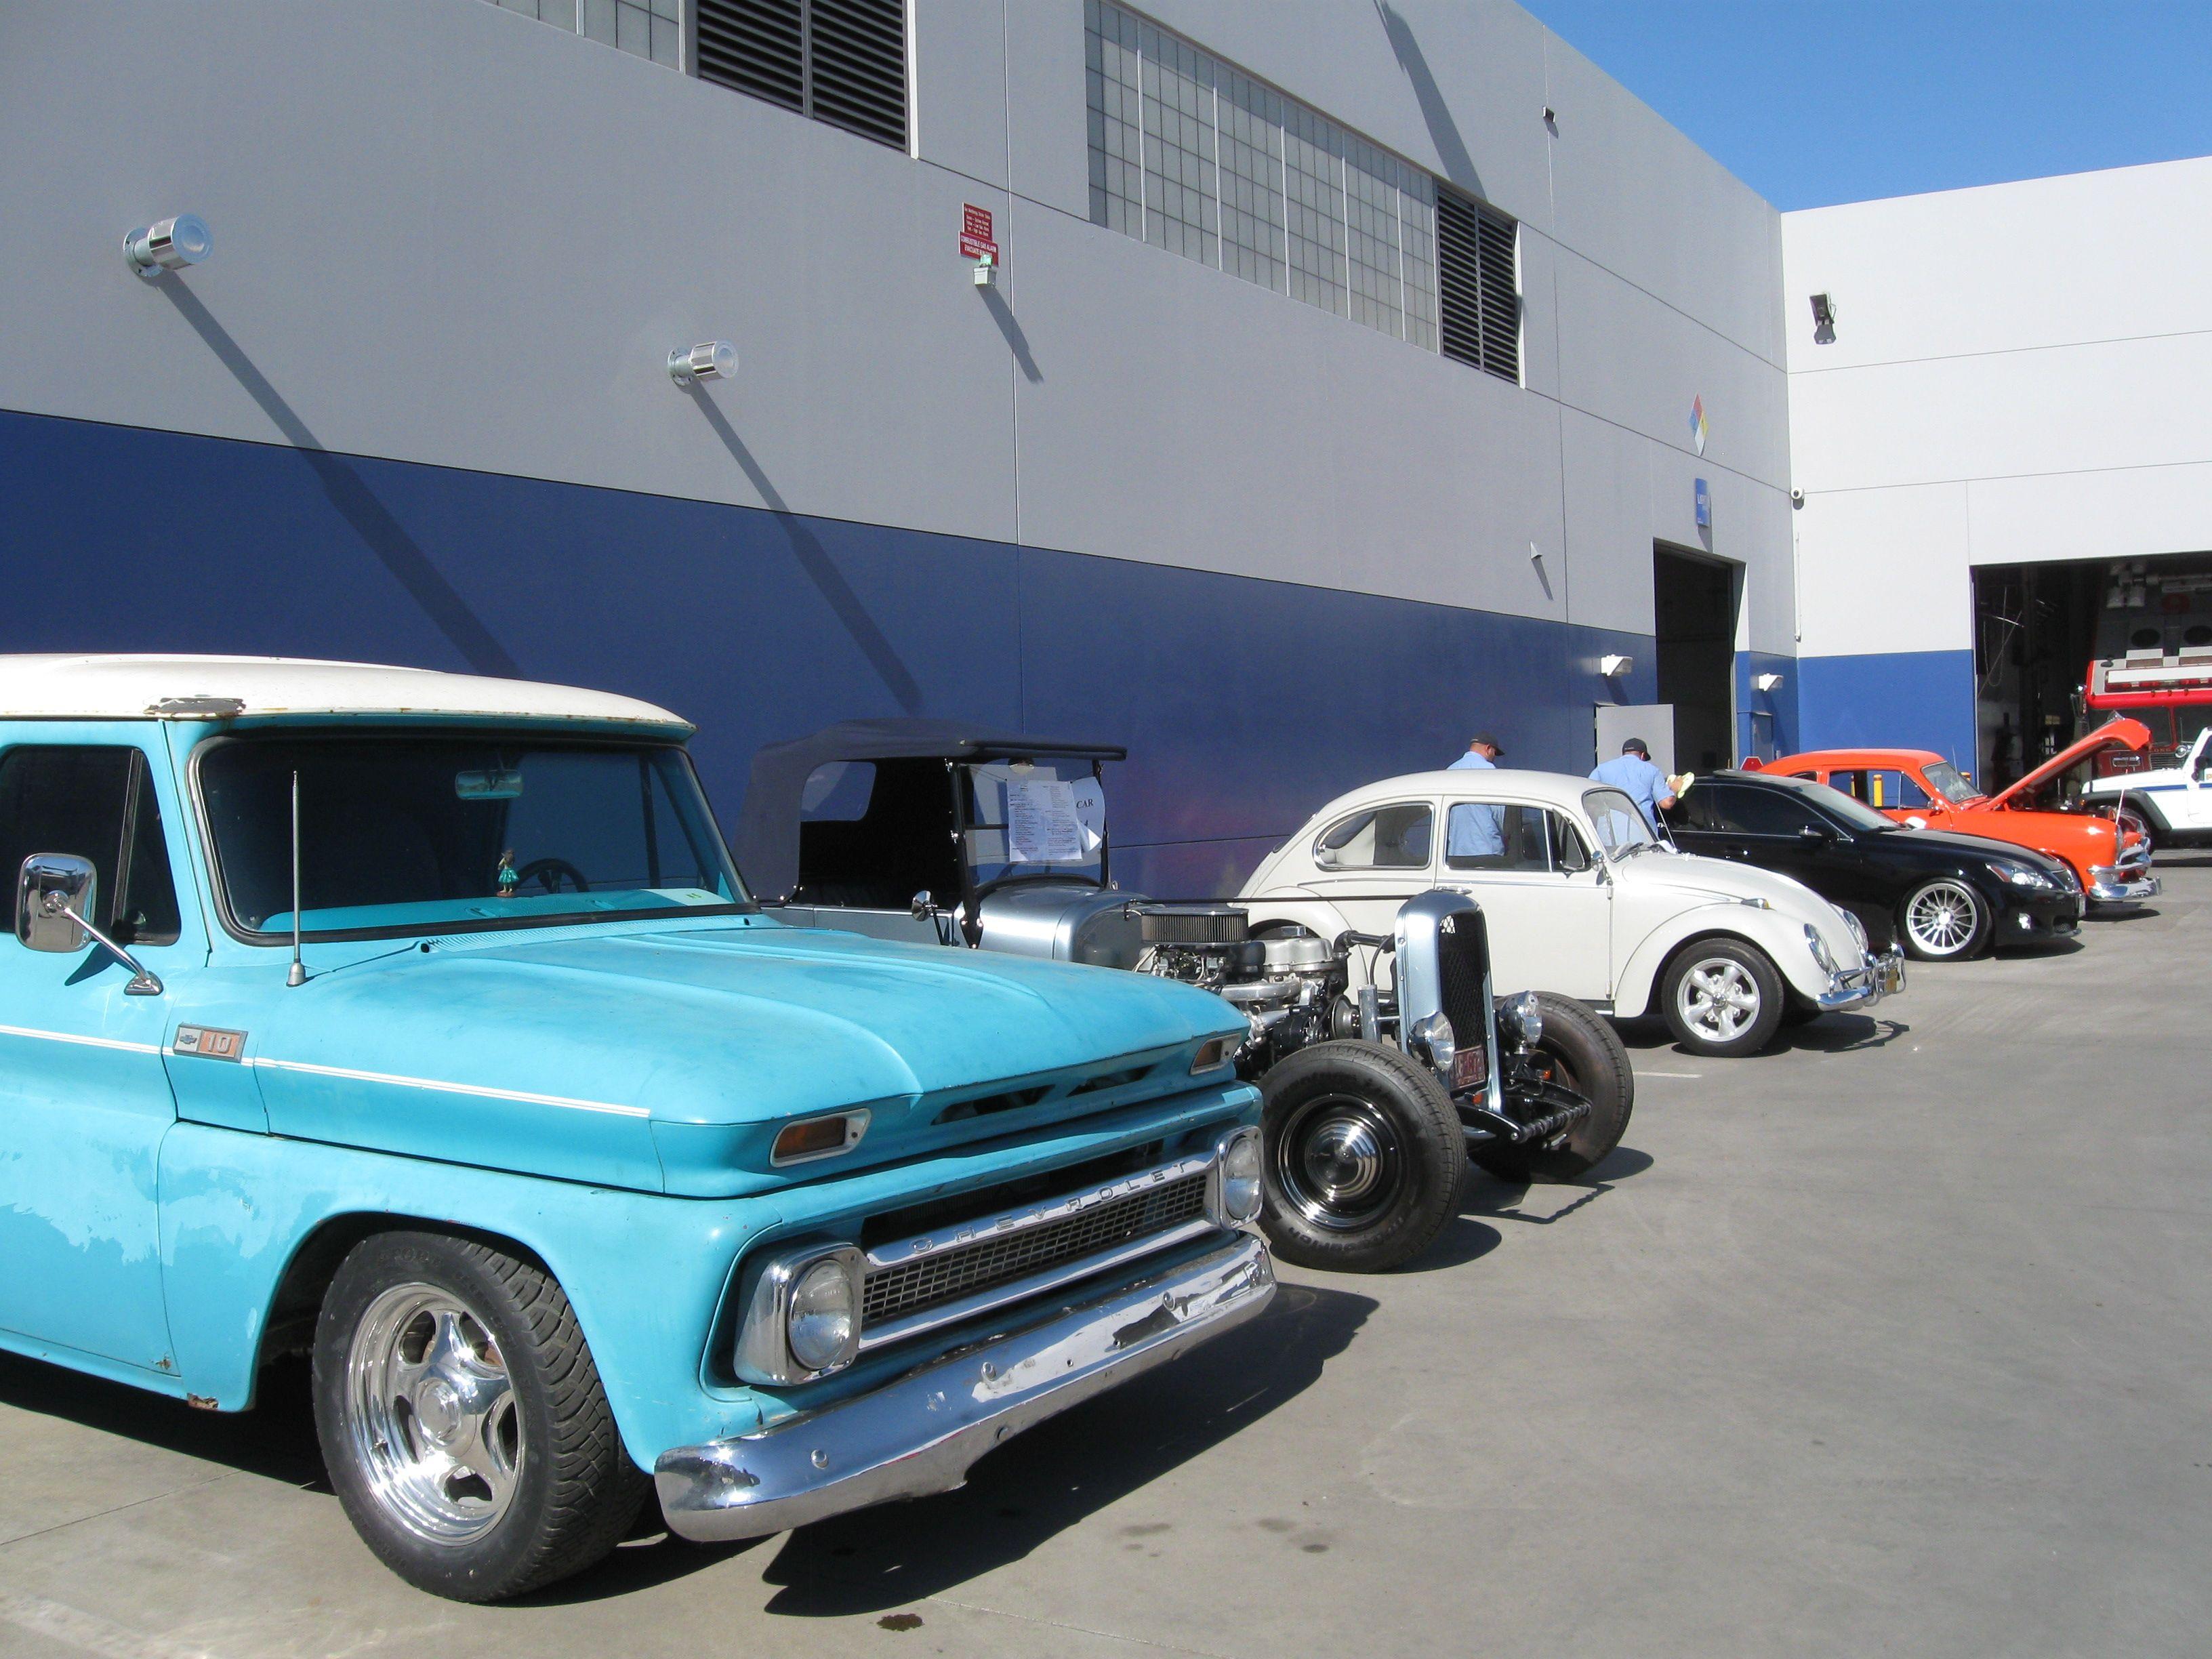 City of Long Beach Holds Annual Fleet Car Show